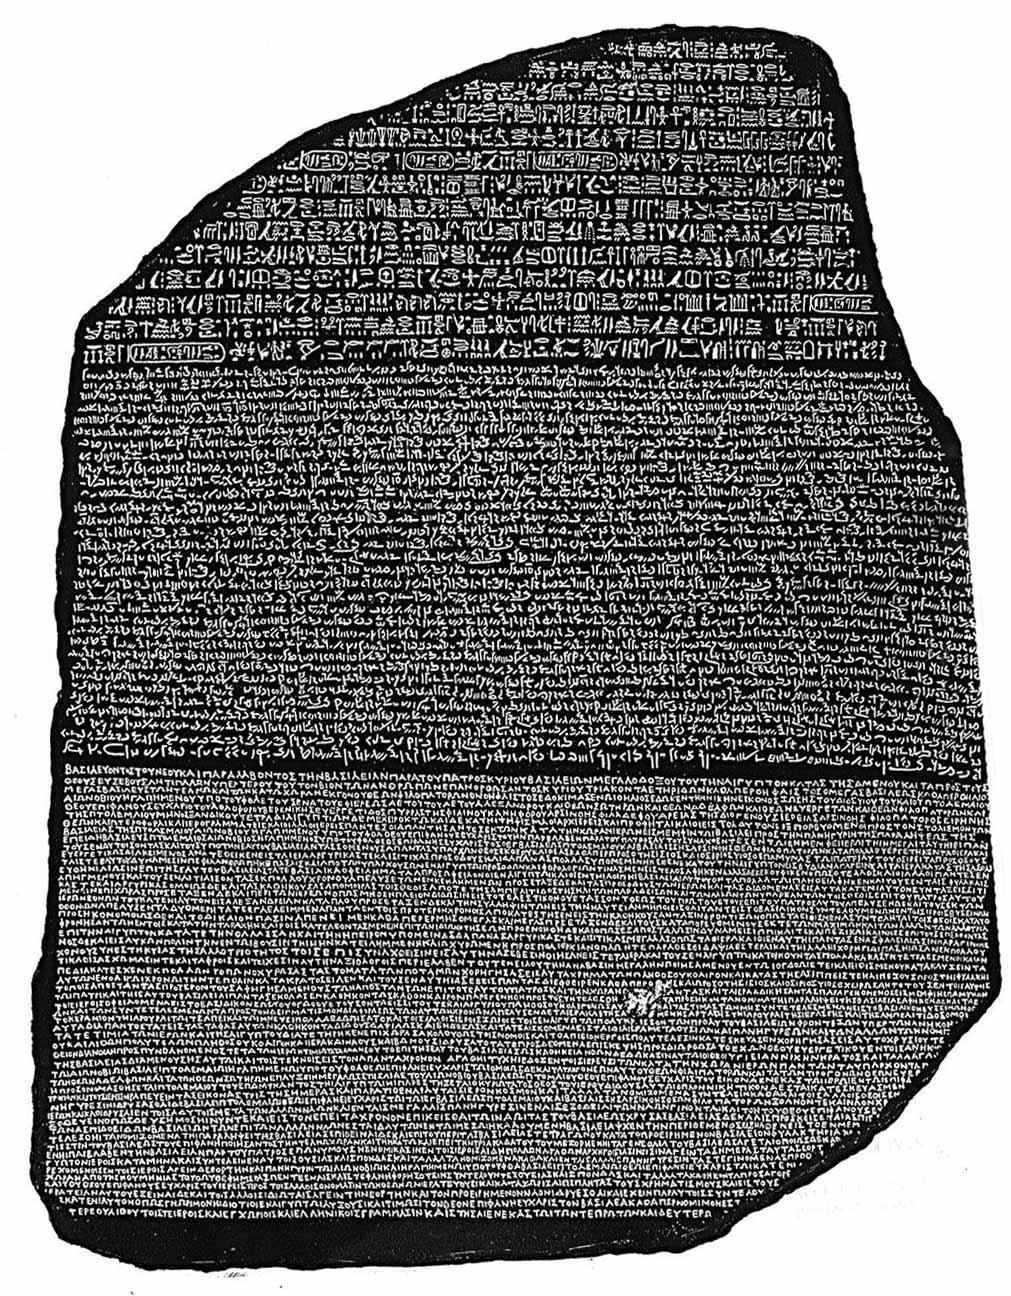 rosetta stone egyptian writing and art